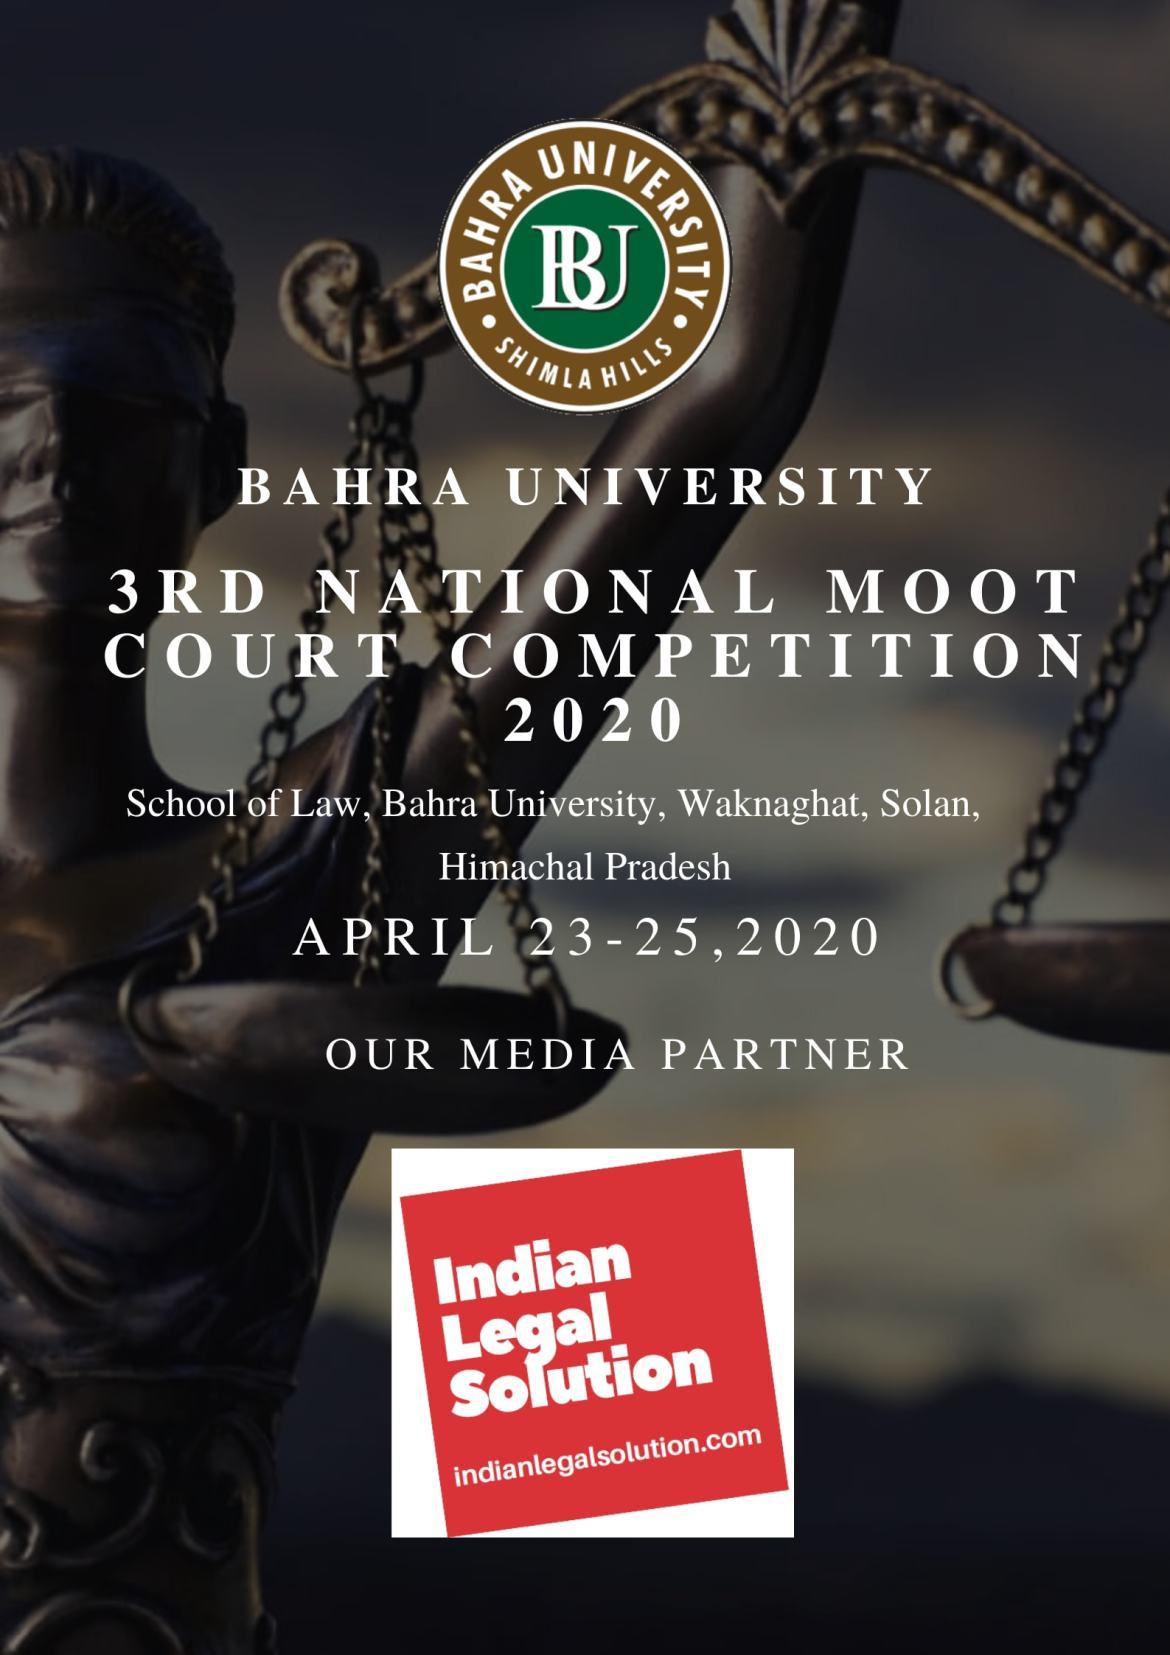 3rd National Moot Court Competition @Bahra University Shimla Hills) 23rd -25 April 2020